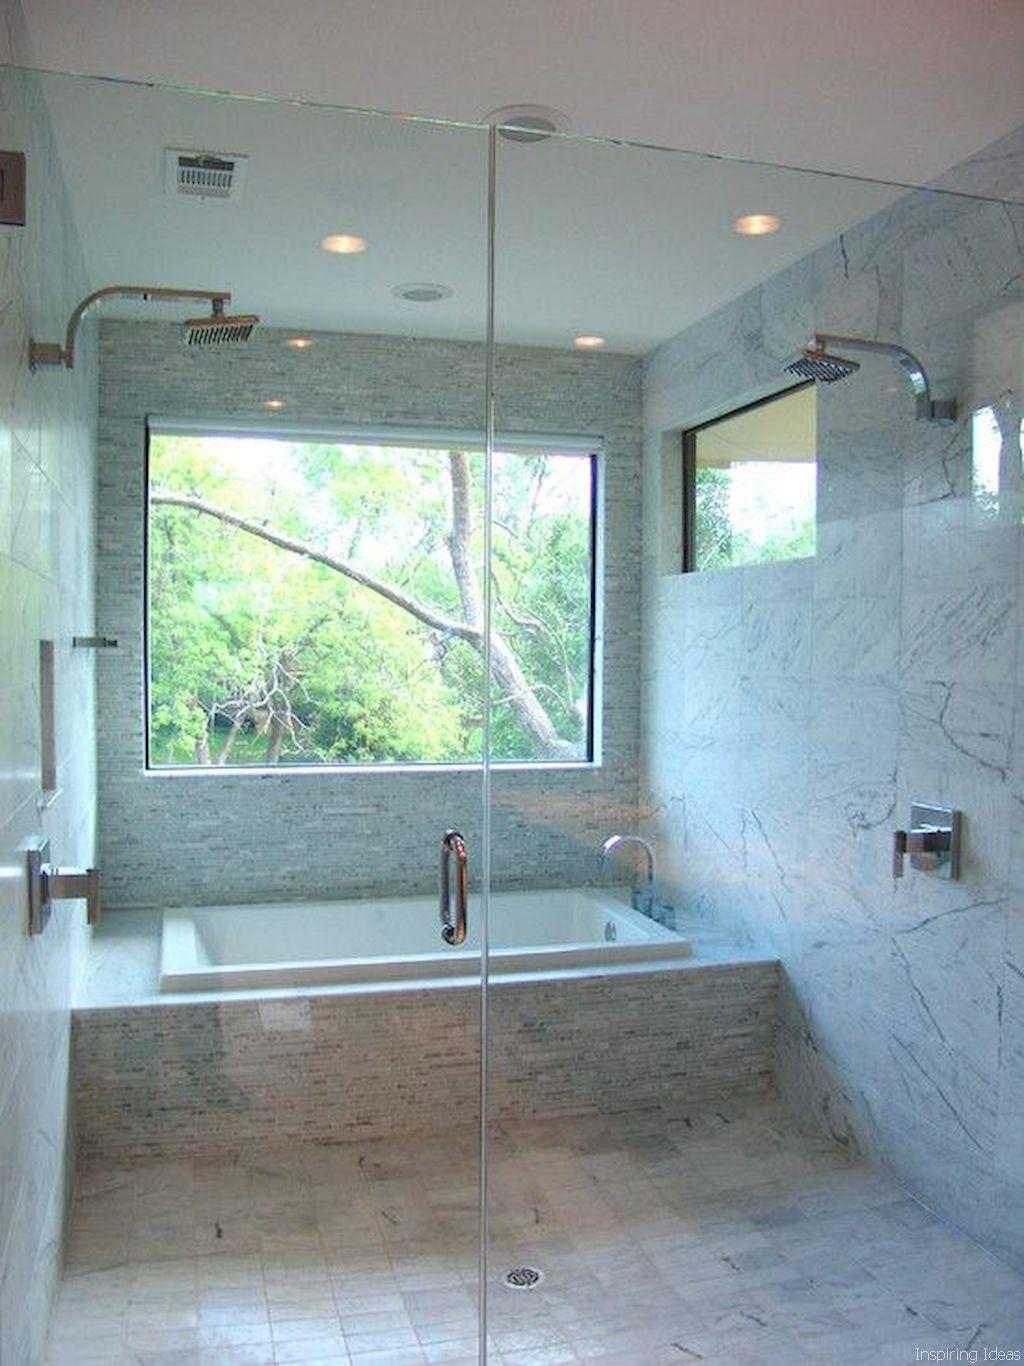 Adorable 55 Beautiful Bathroom Remodel Ideas Https Roomaholic Com 5643 55 Beautiful Bathroom R Bathroom Tub Shower Combo Bathroom Tub Shower Window In Shower